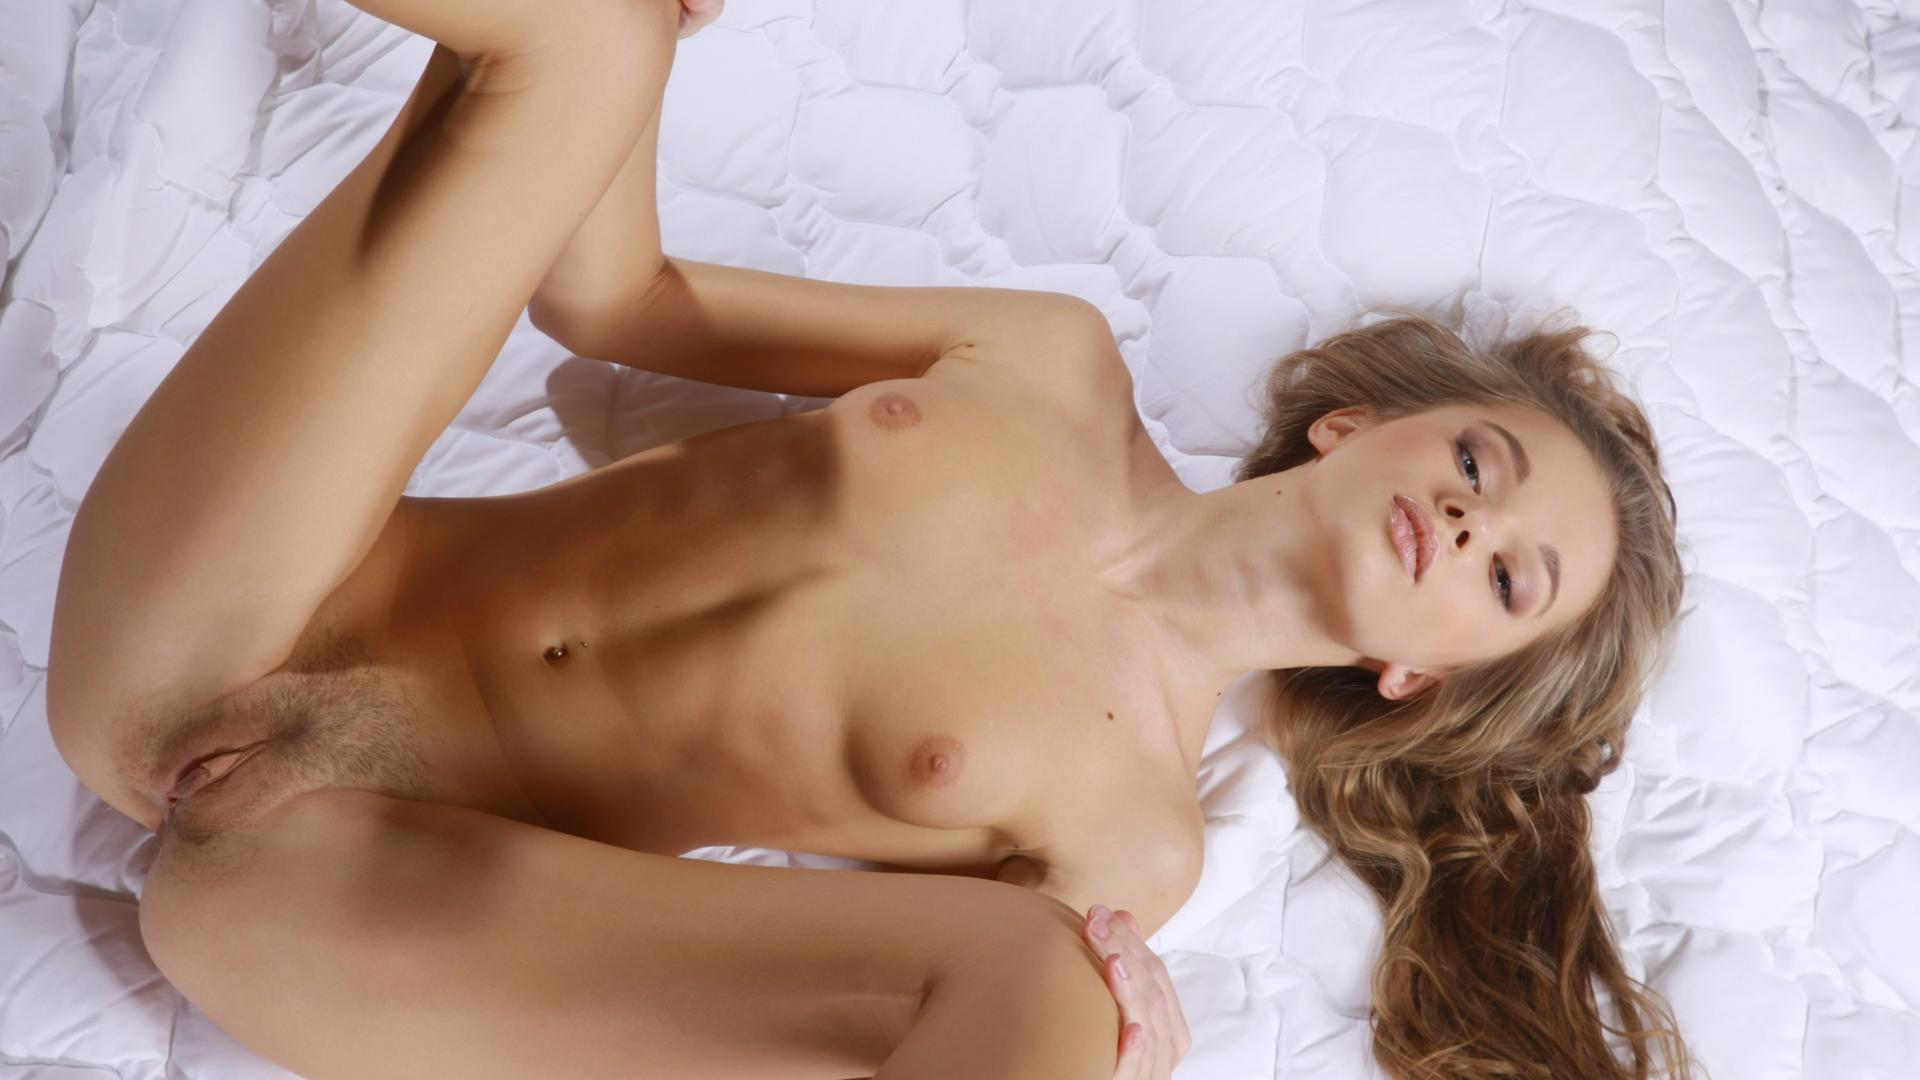 sexy girls next door in bikinis